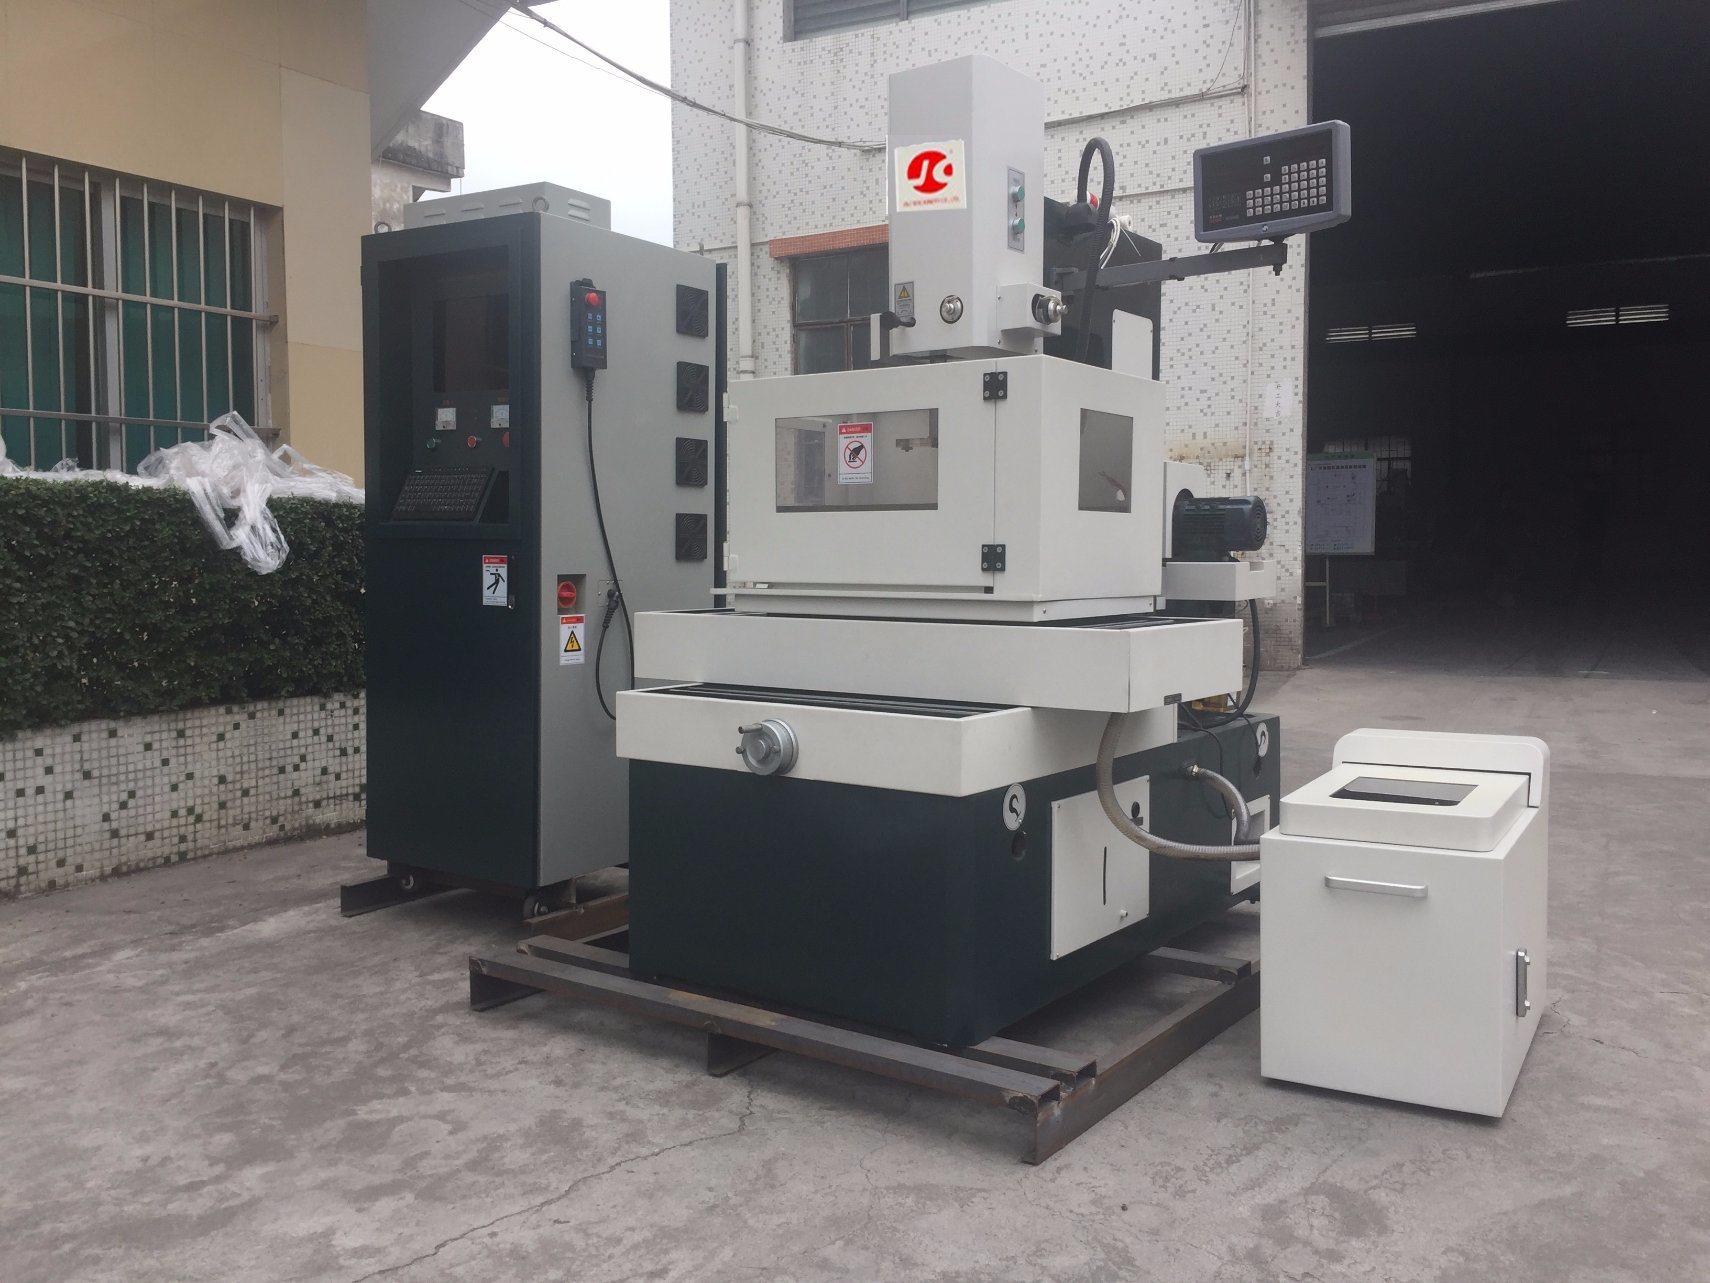 Jc-4050z Version 2 Multi Cut Medium Speed Wire Cutting EDM Machine